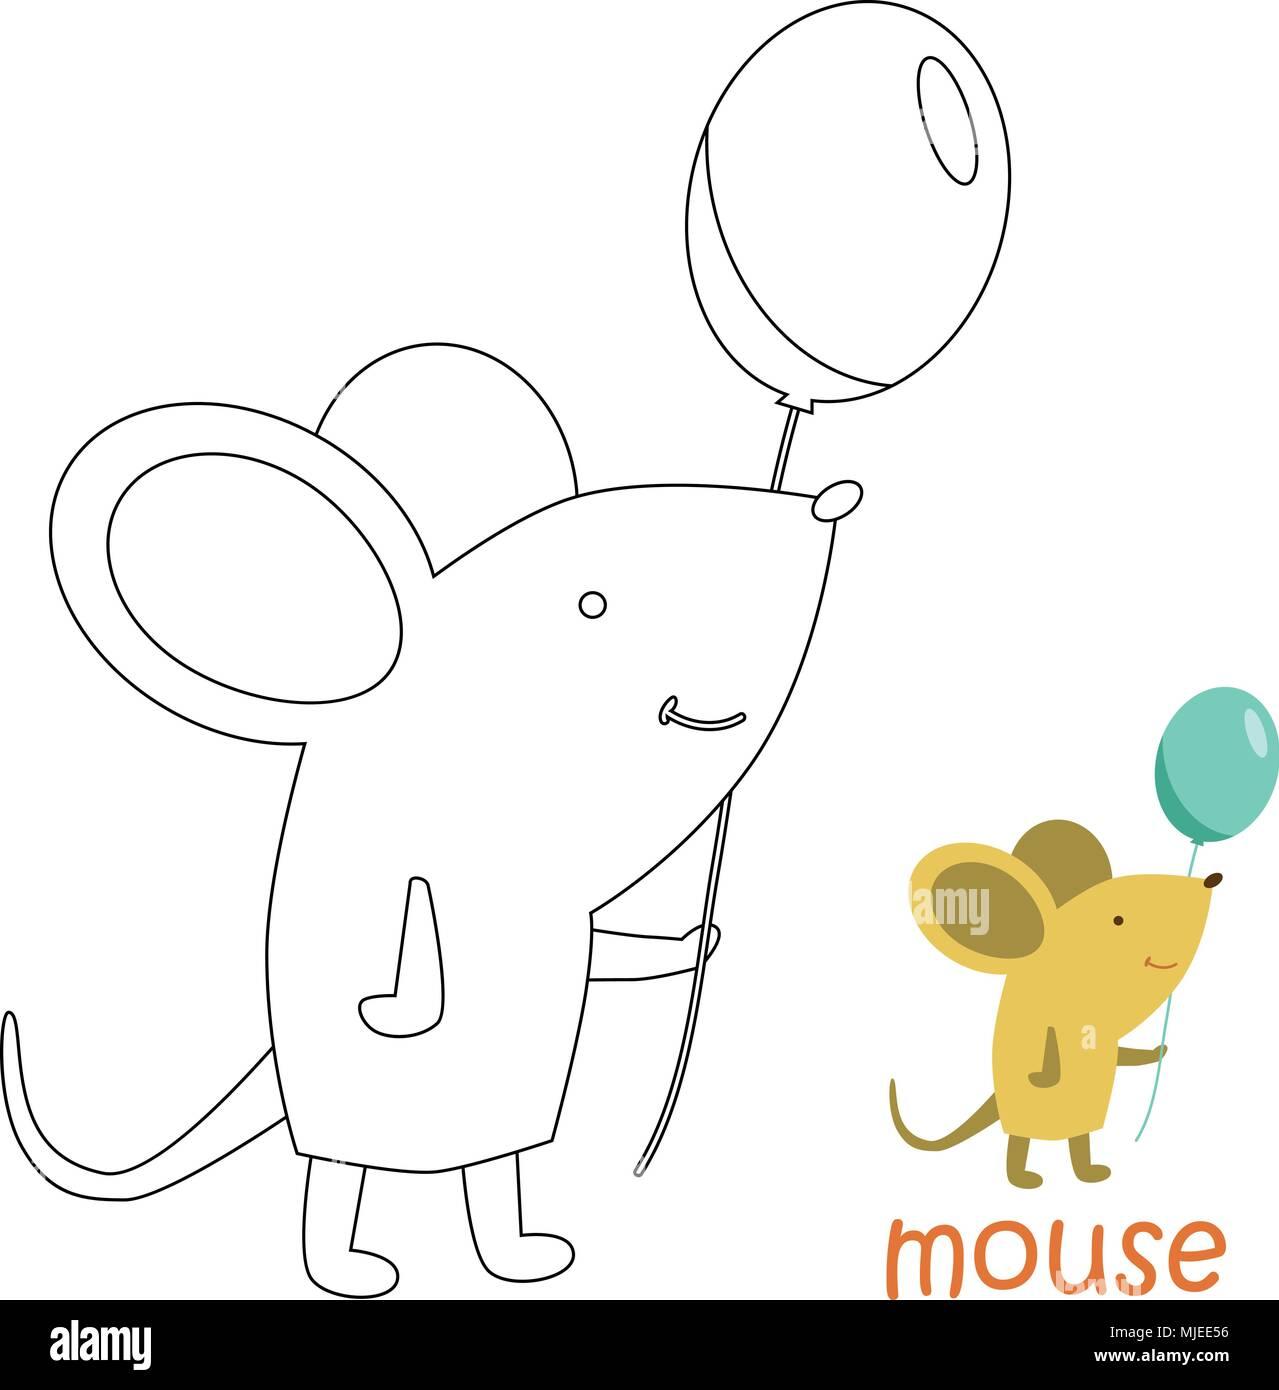 Mouse Cartoon Stockfotos & Mouse Cartoon Bilder - Seite 8 - Alamy